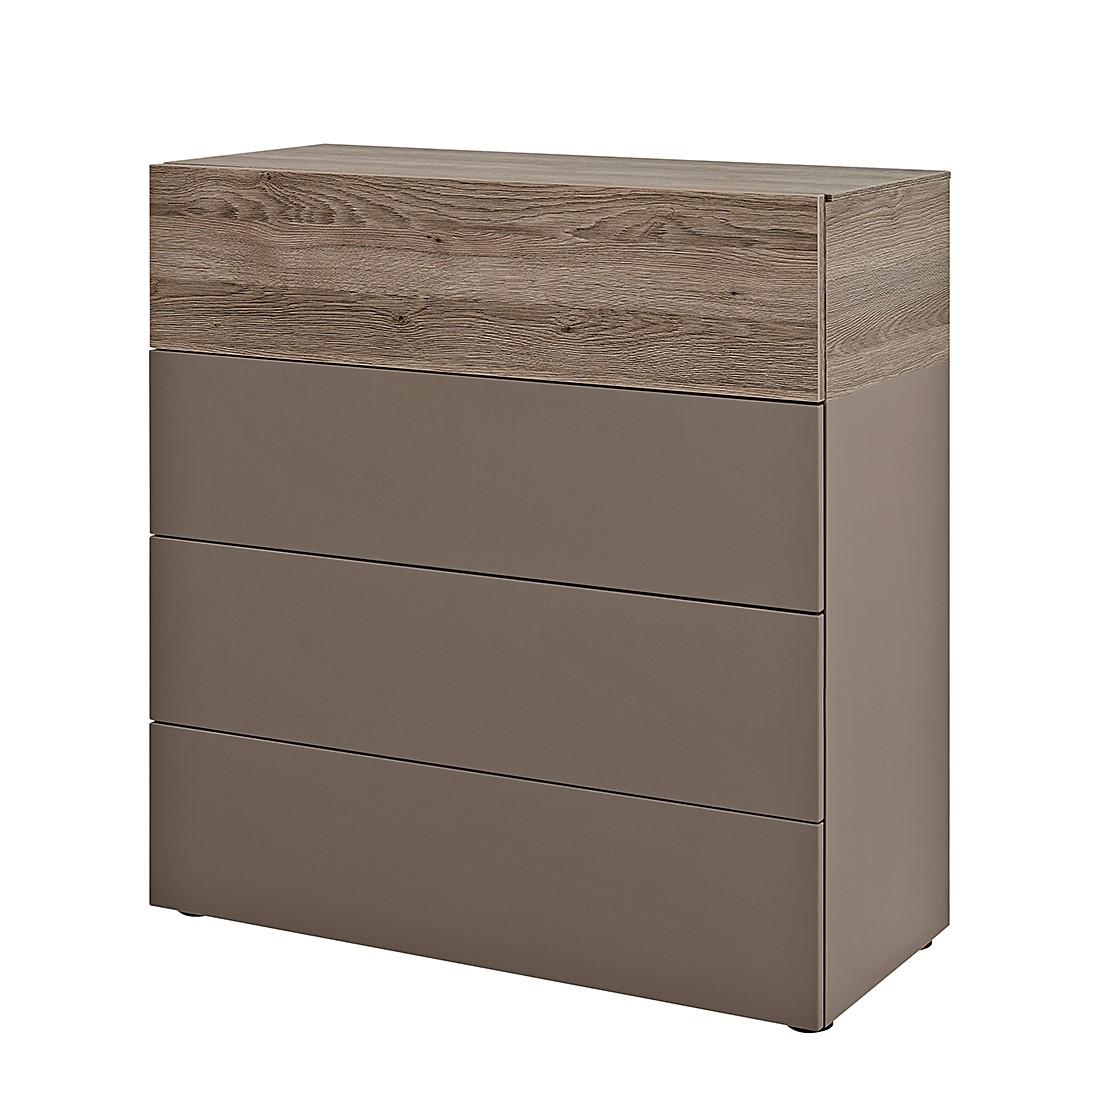 tula chene fonce commode 1 porte blanc comparer les prix et promo. Black Bedroom Furniture Sets. Home Design Ideas